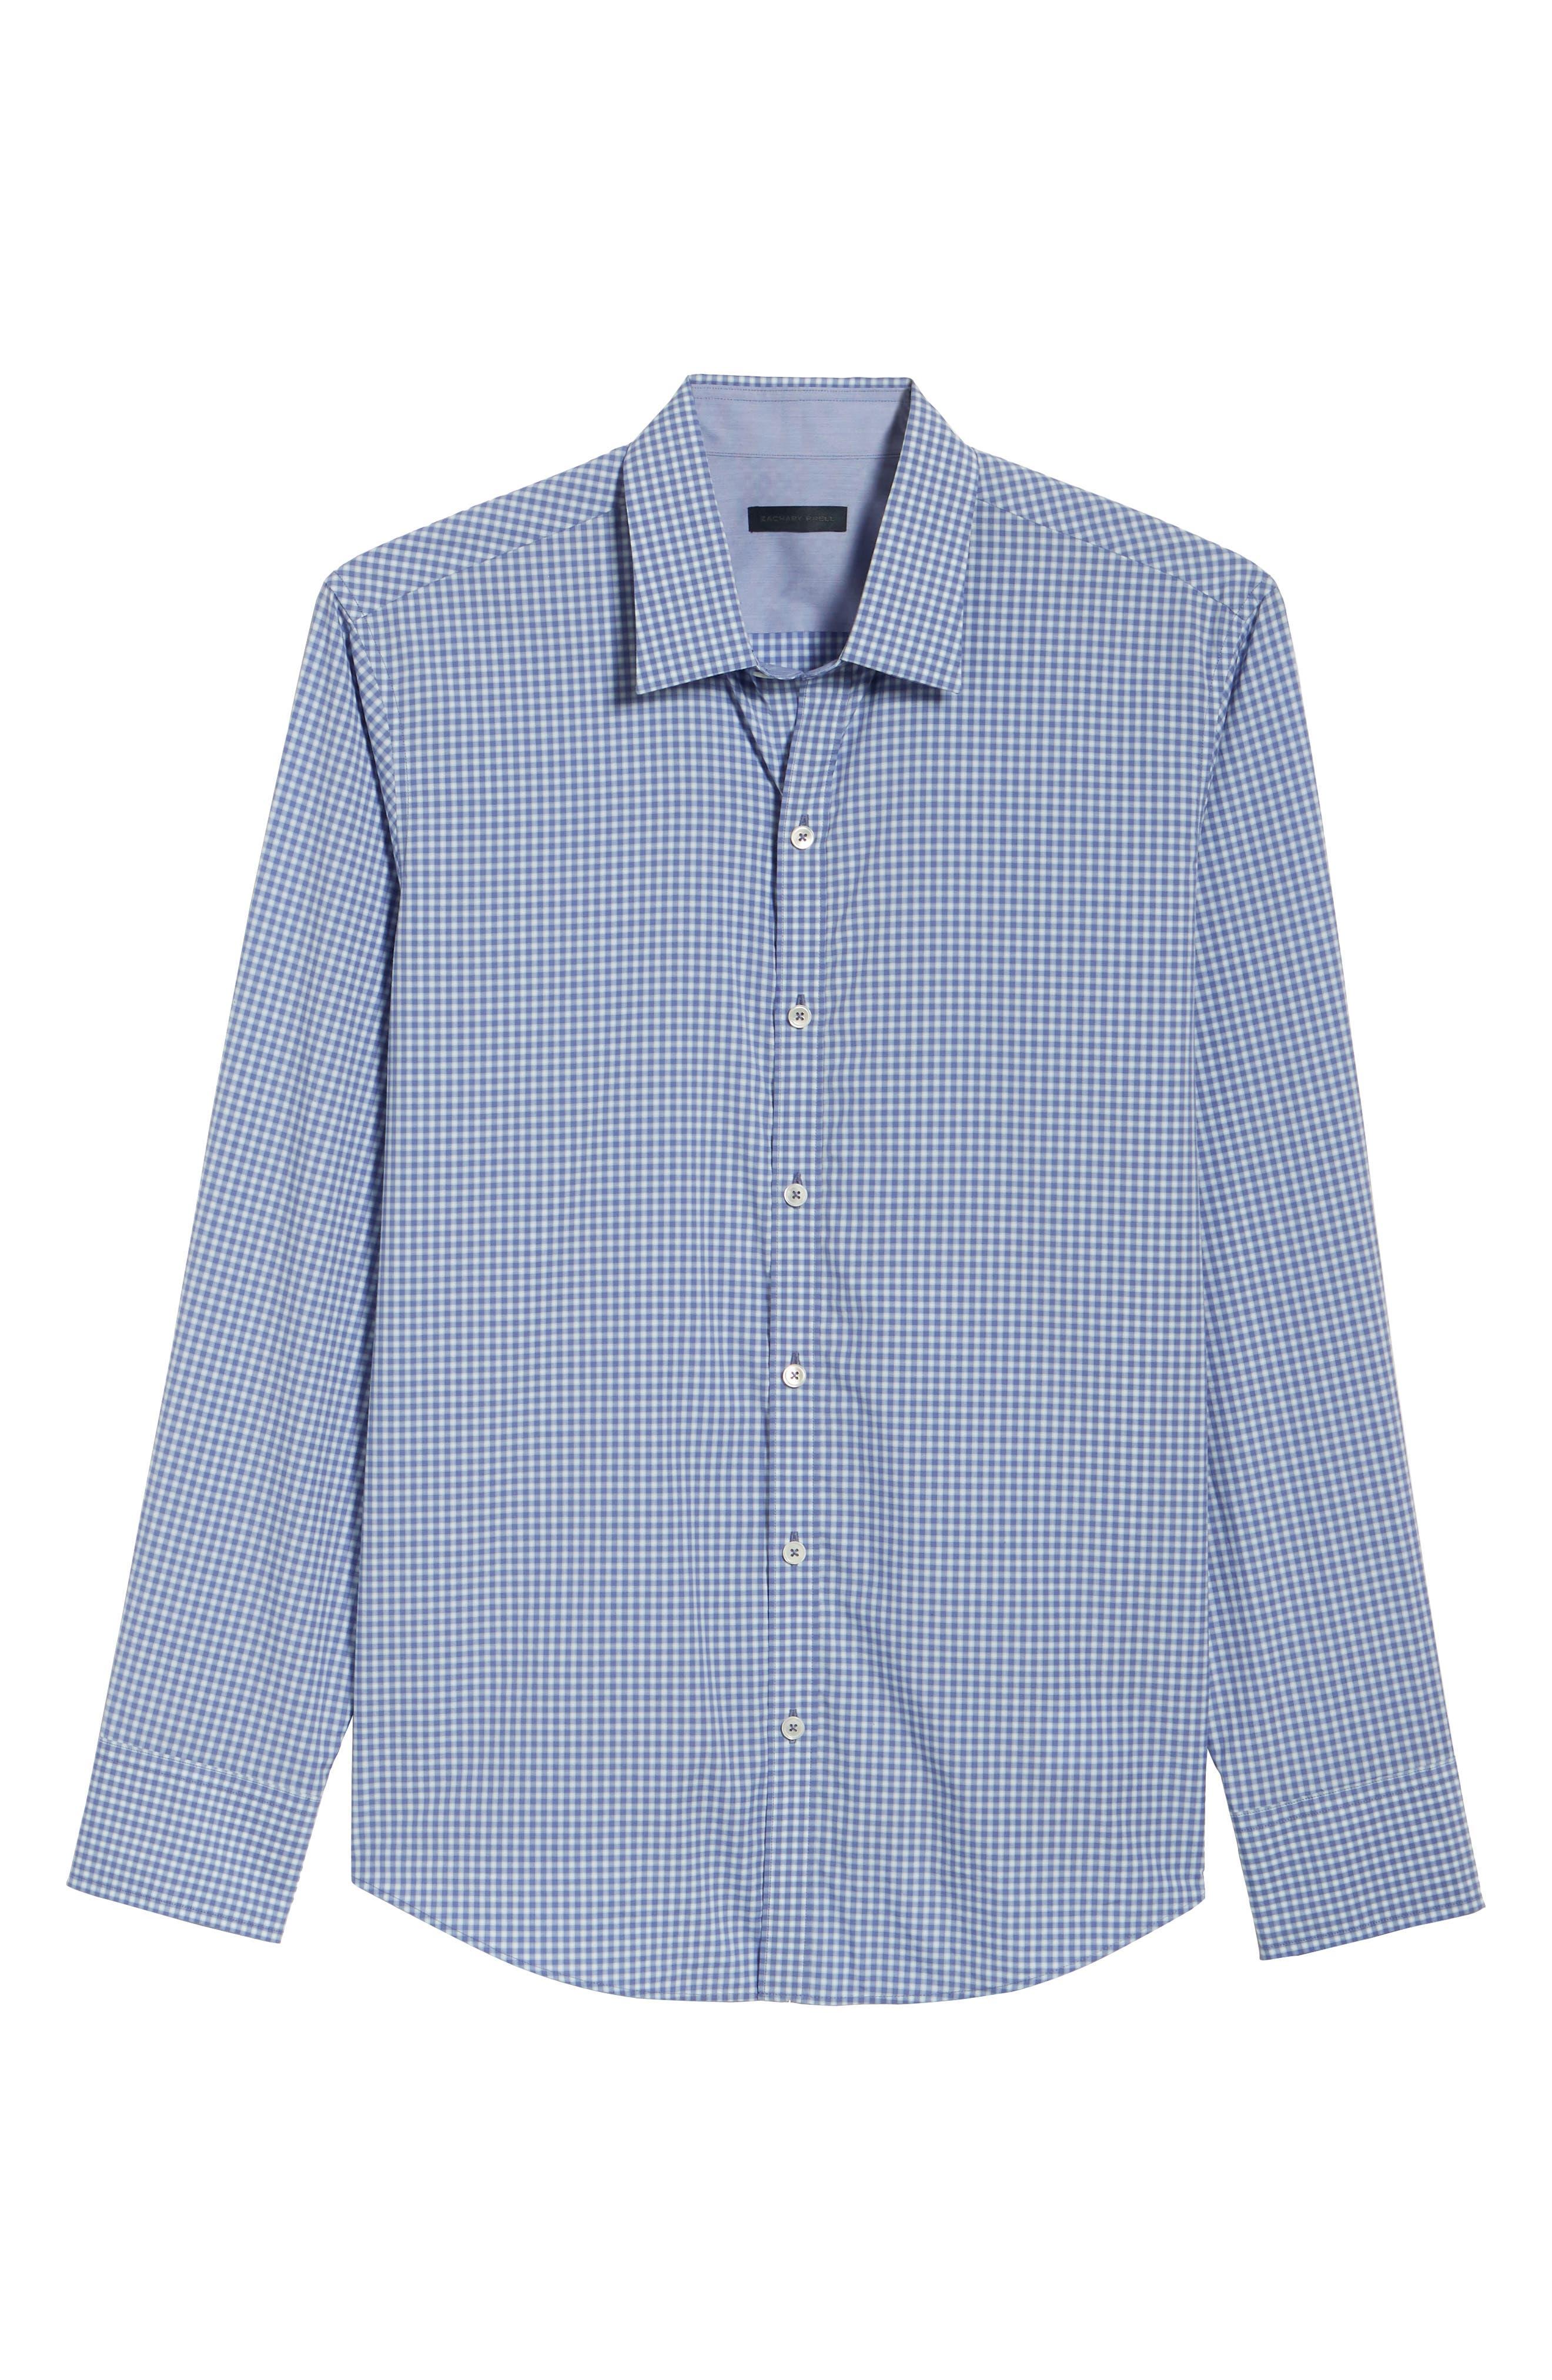 Winston Regular Fit Sport Shirt,                             Alternate thumbnail 6, color,                             422